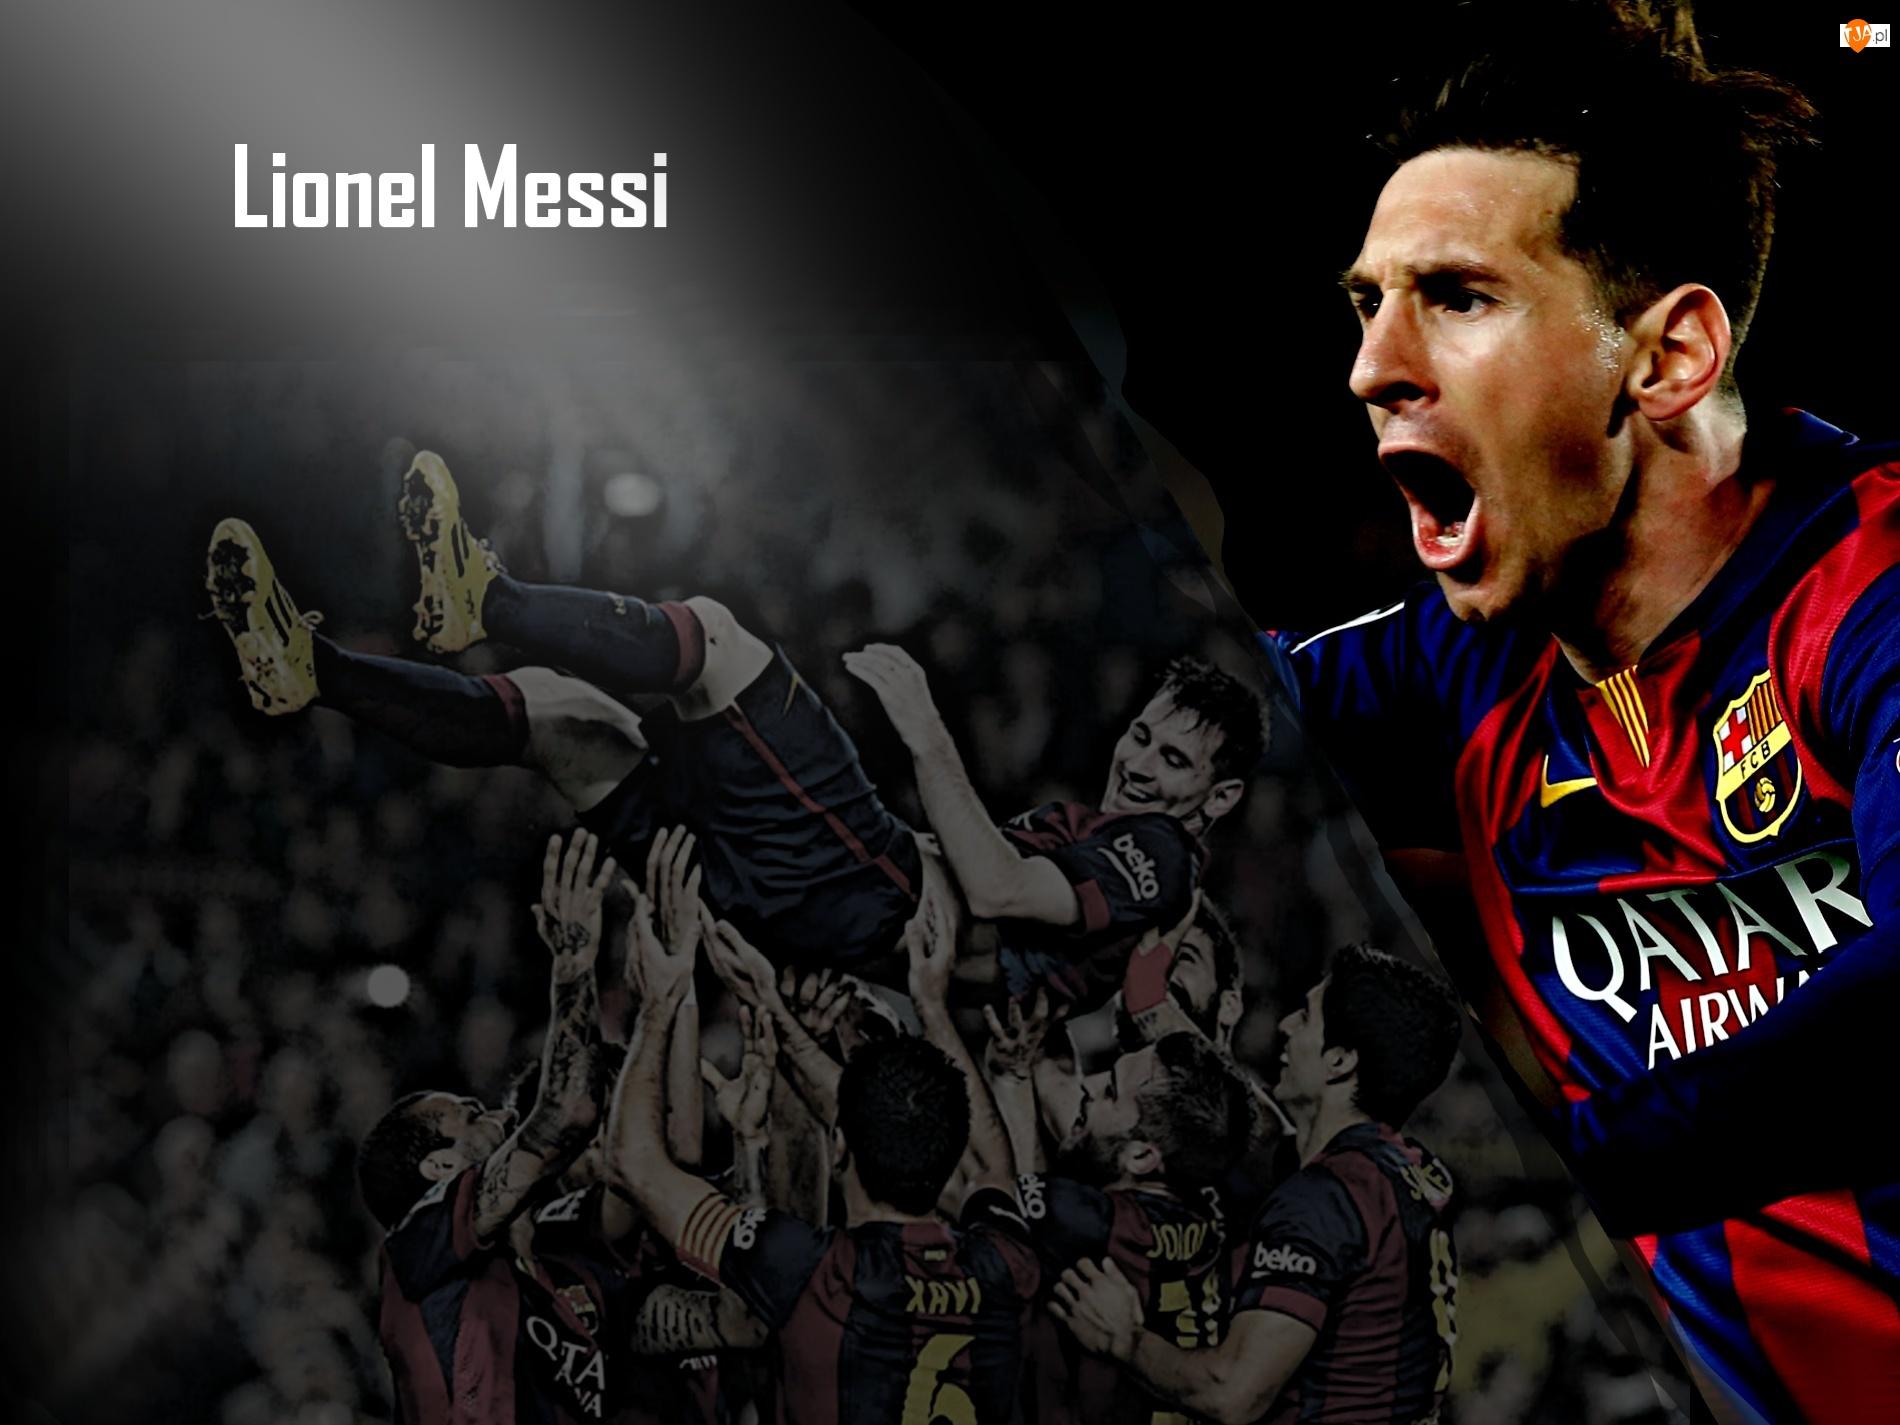 Barcelona, Piłka Nożna, Lionel Messi, Piłkarz, Messi, FC Barcelona